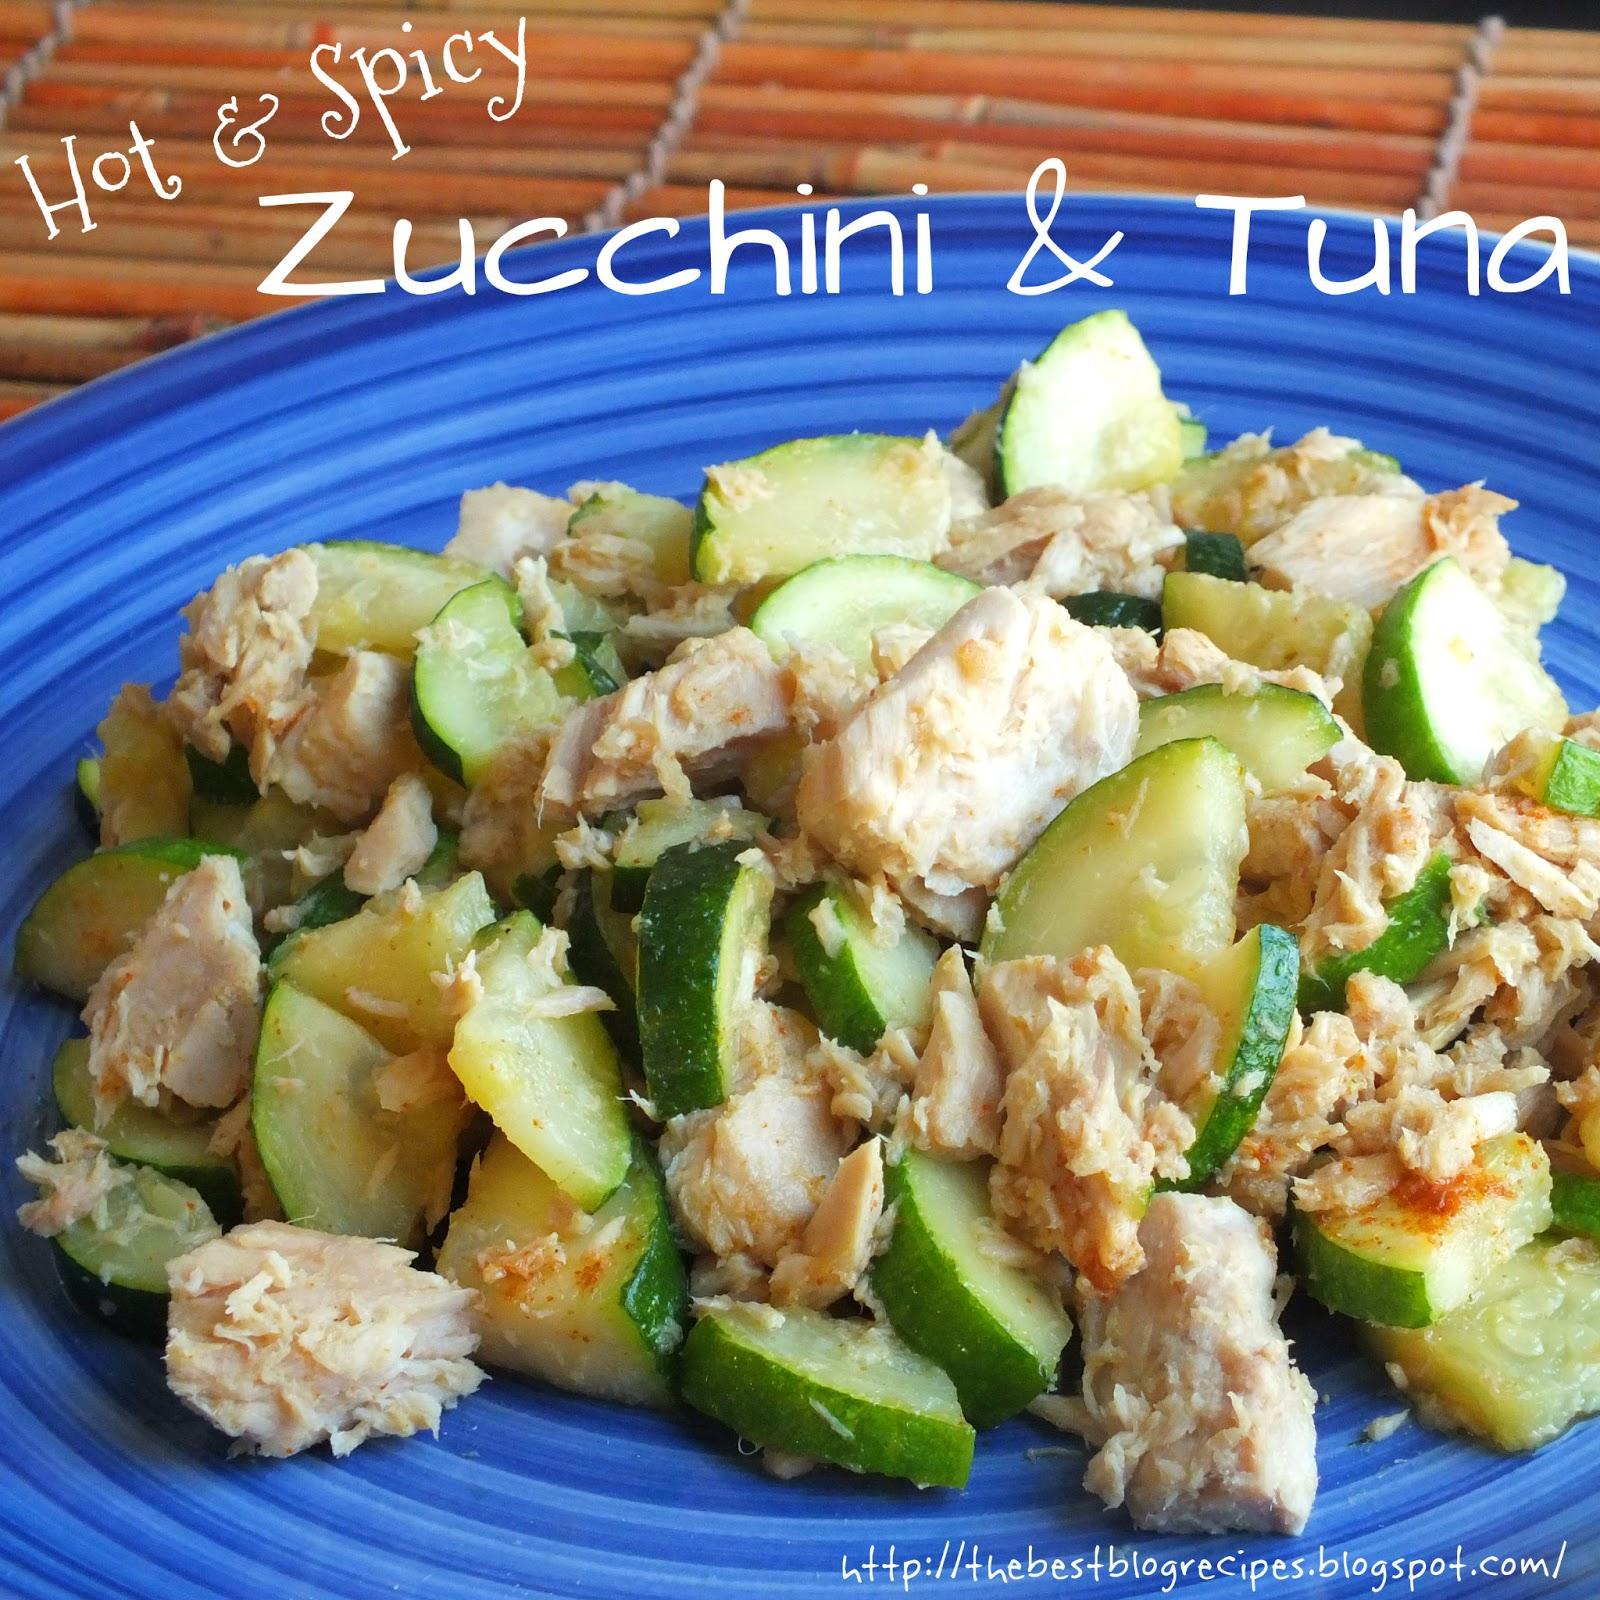 Healthy Zucchini & Tuna recipe from {The Best Blog Recies}